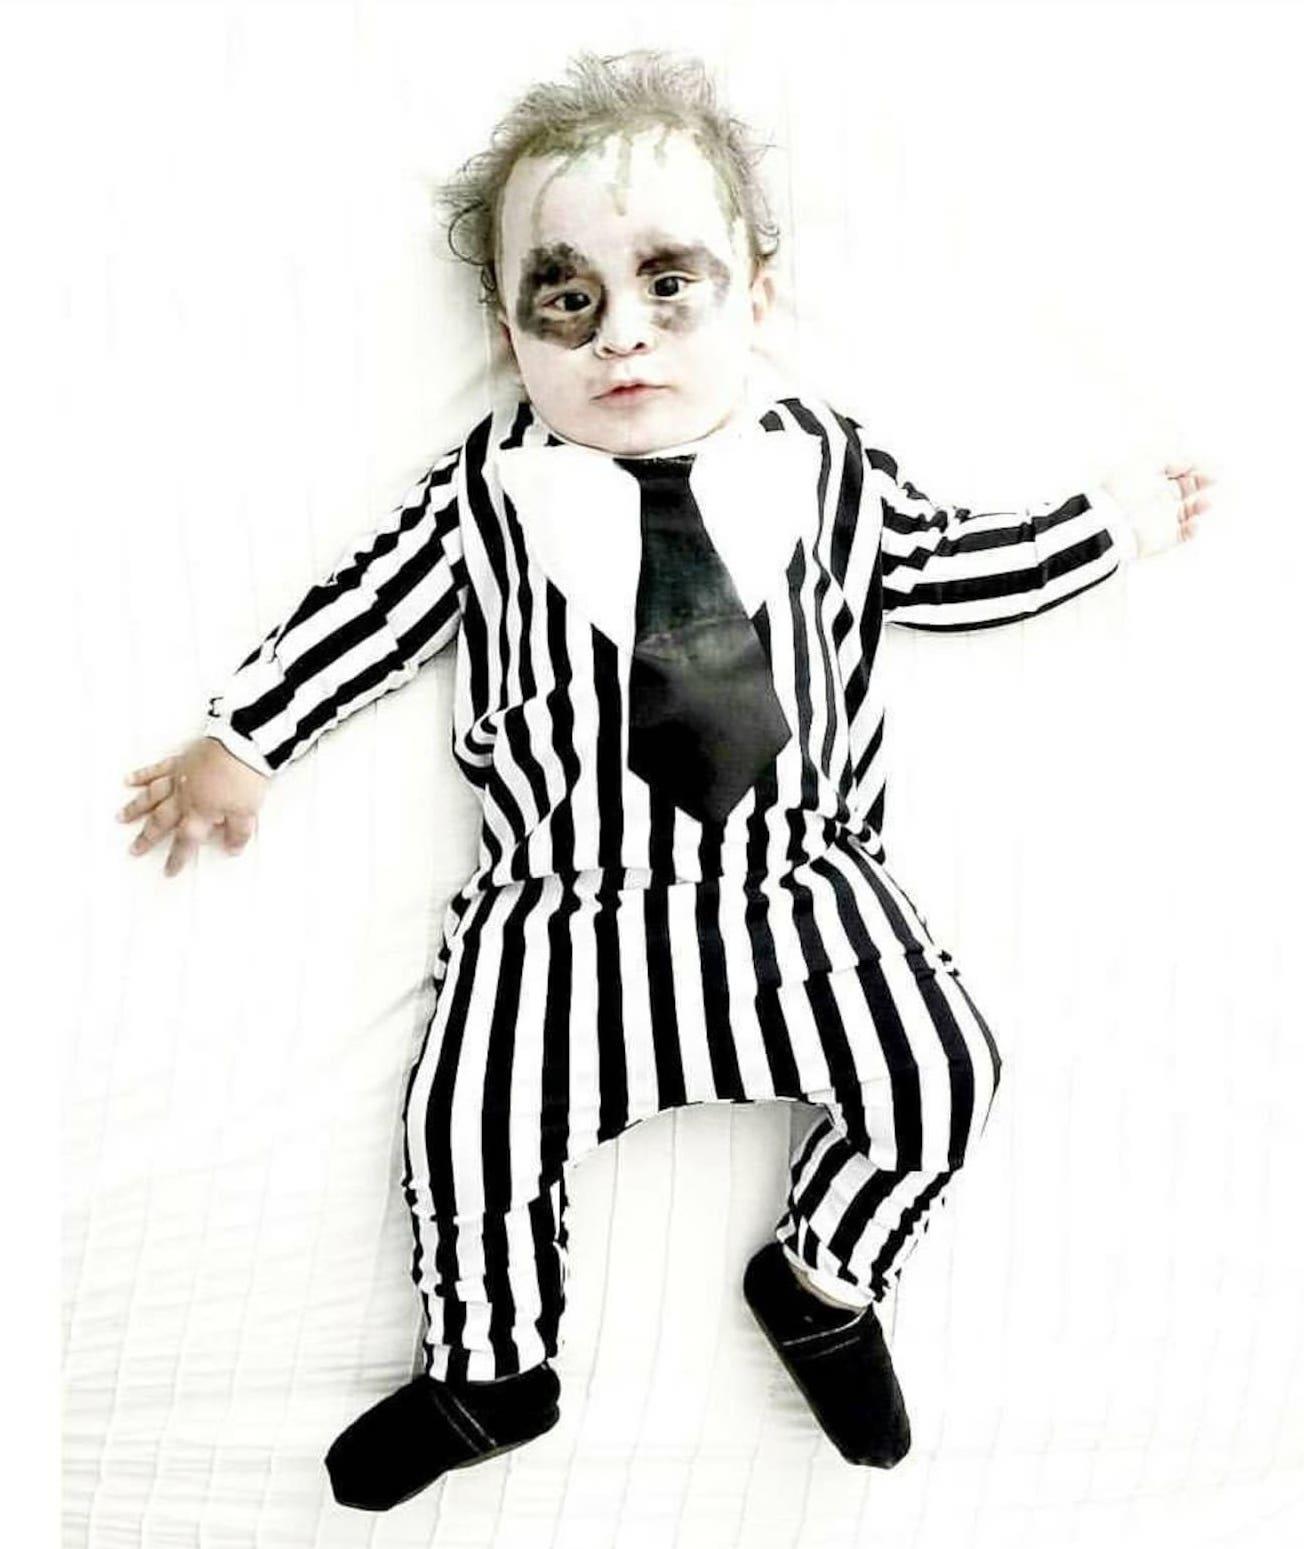 Beetlejuice costume for kids